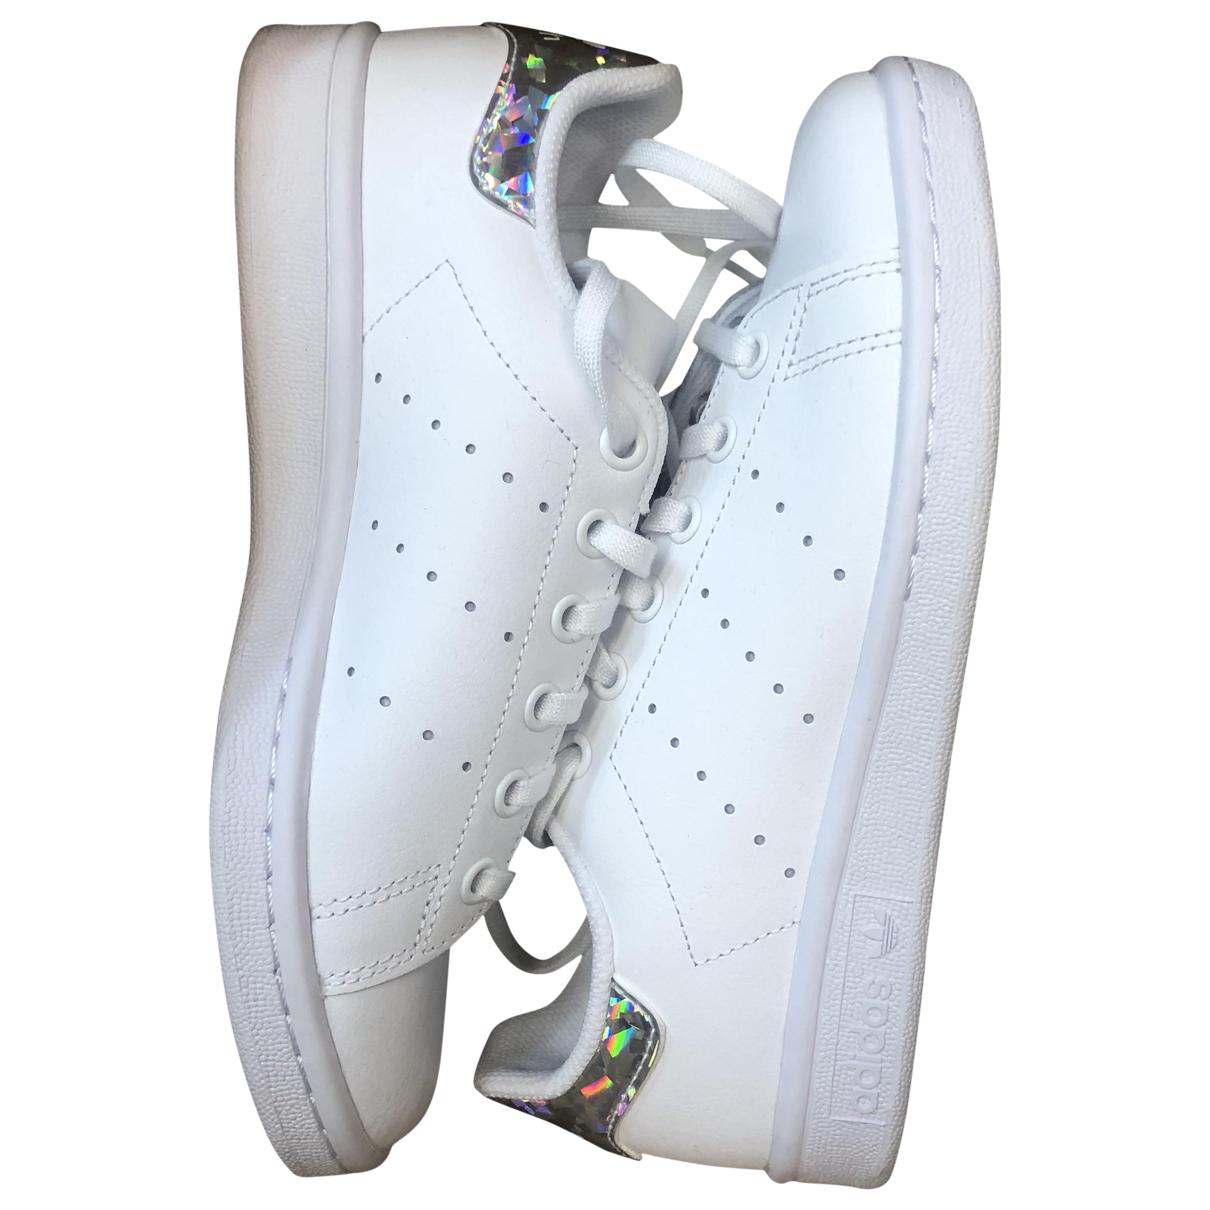 Adidas Stan Smith White Leather Trainers for Women 36 EU